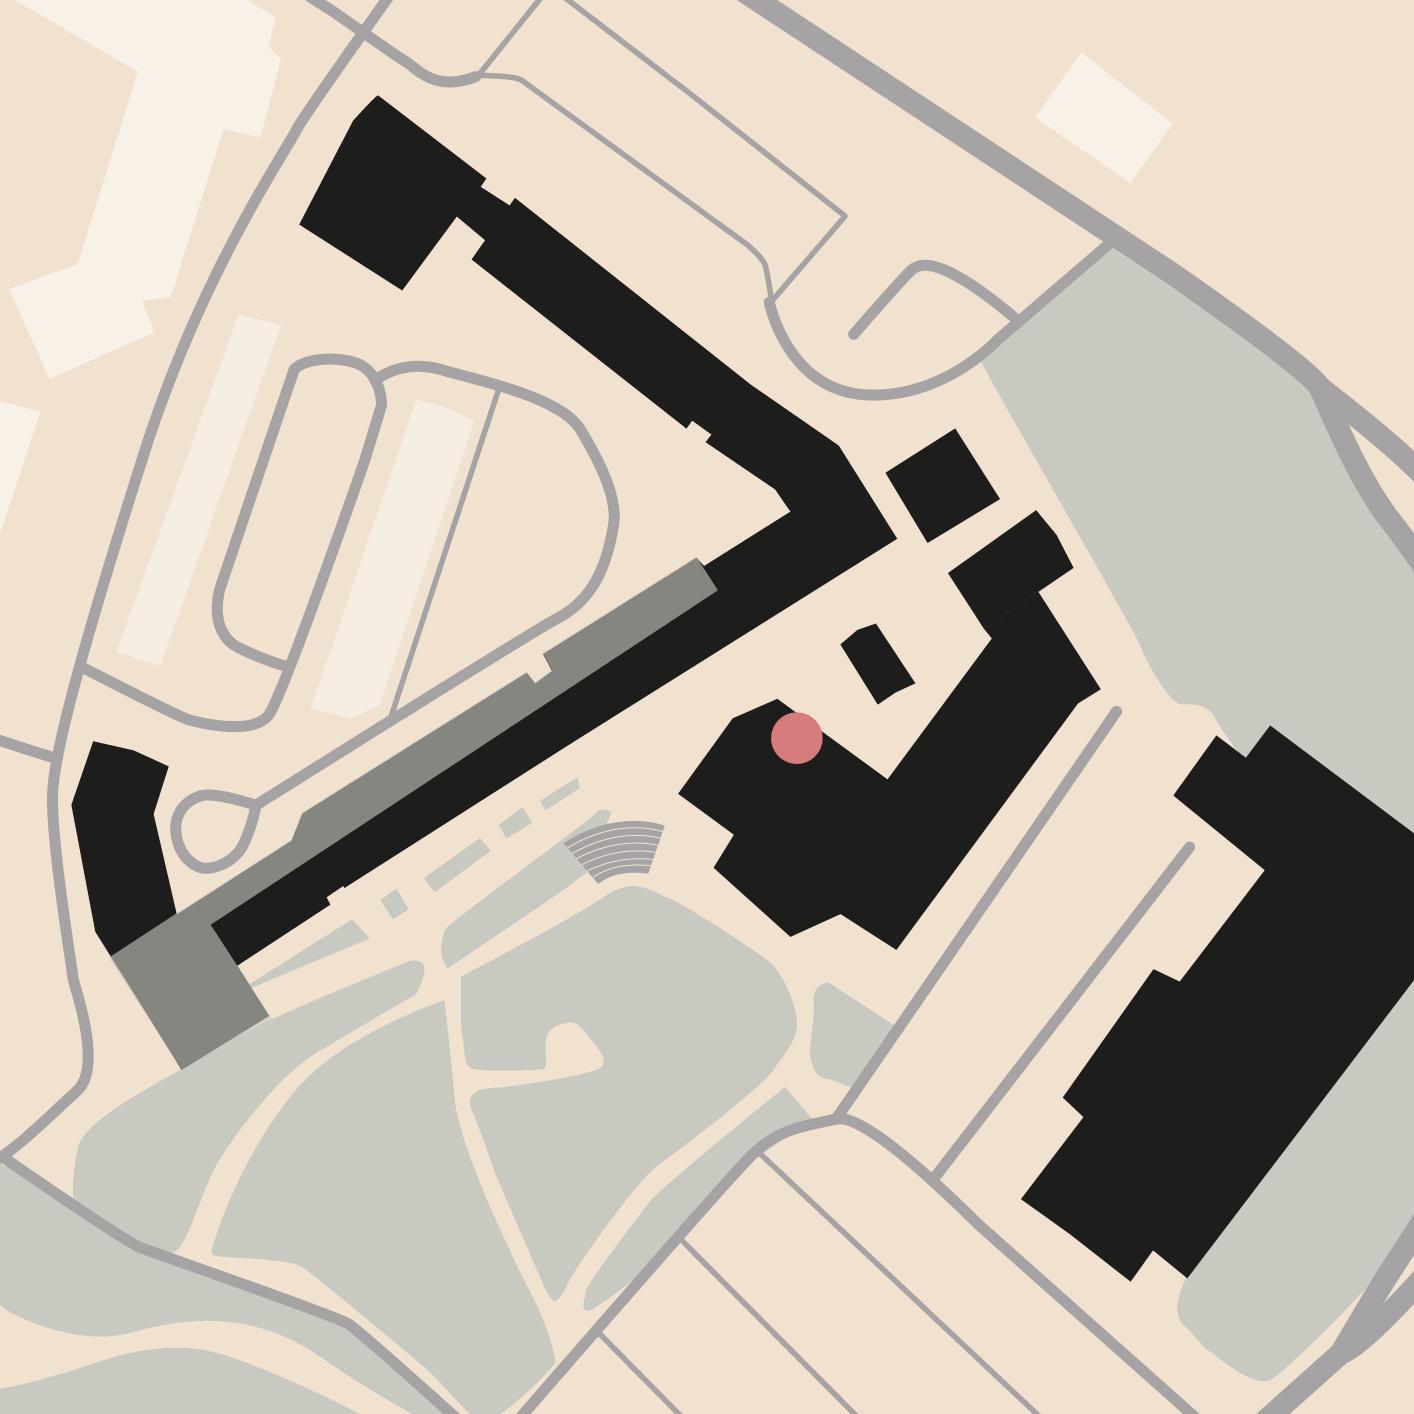 Karta Stjärnurmakarna